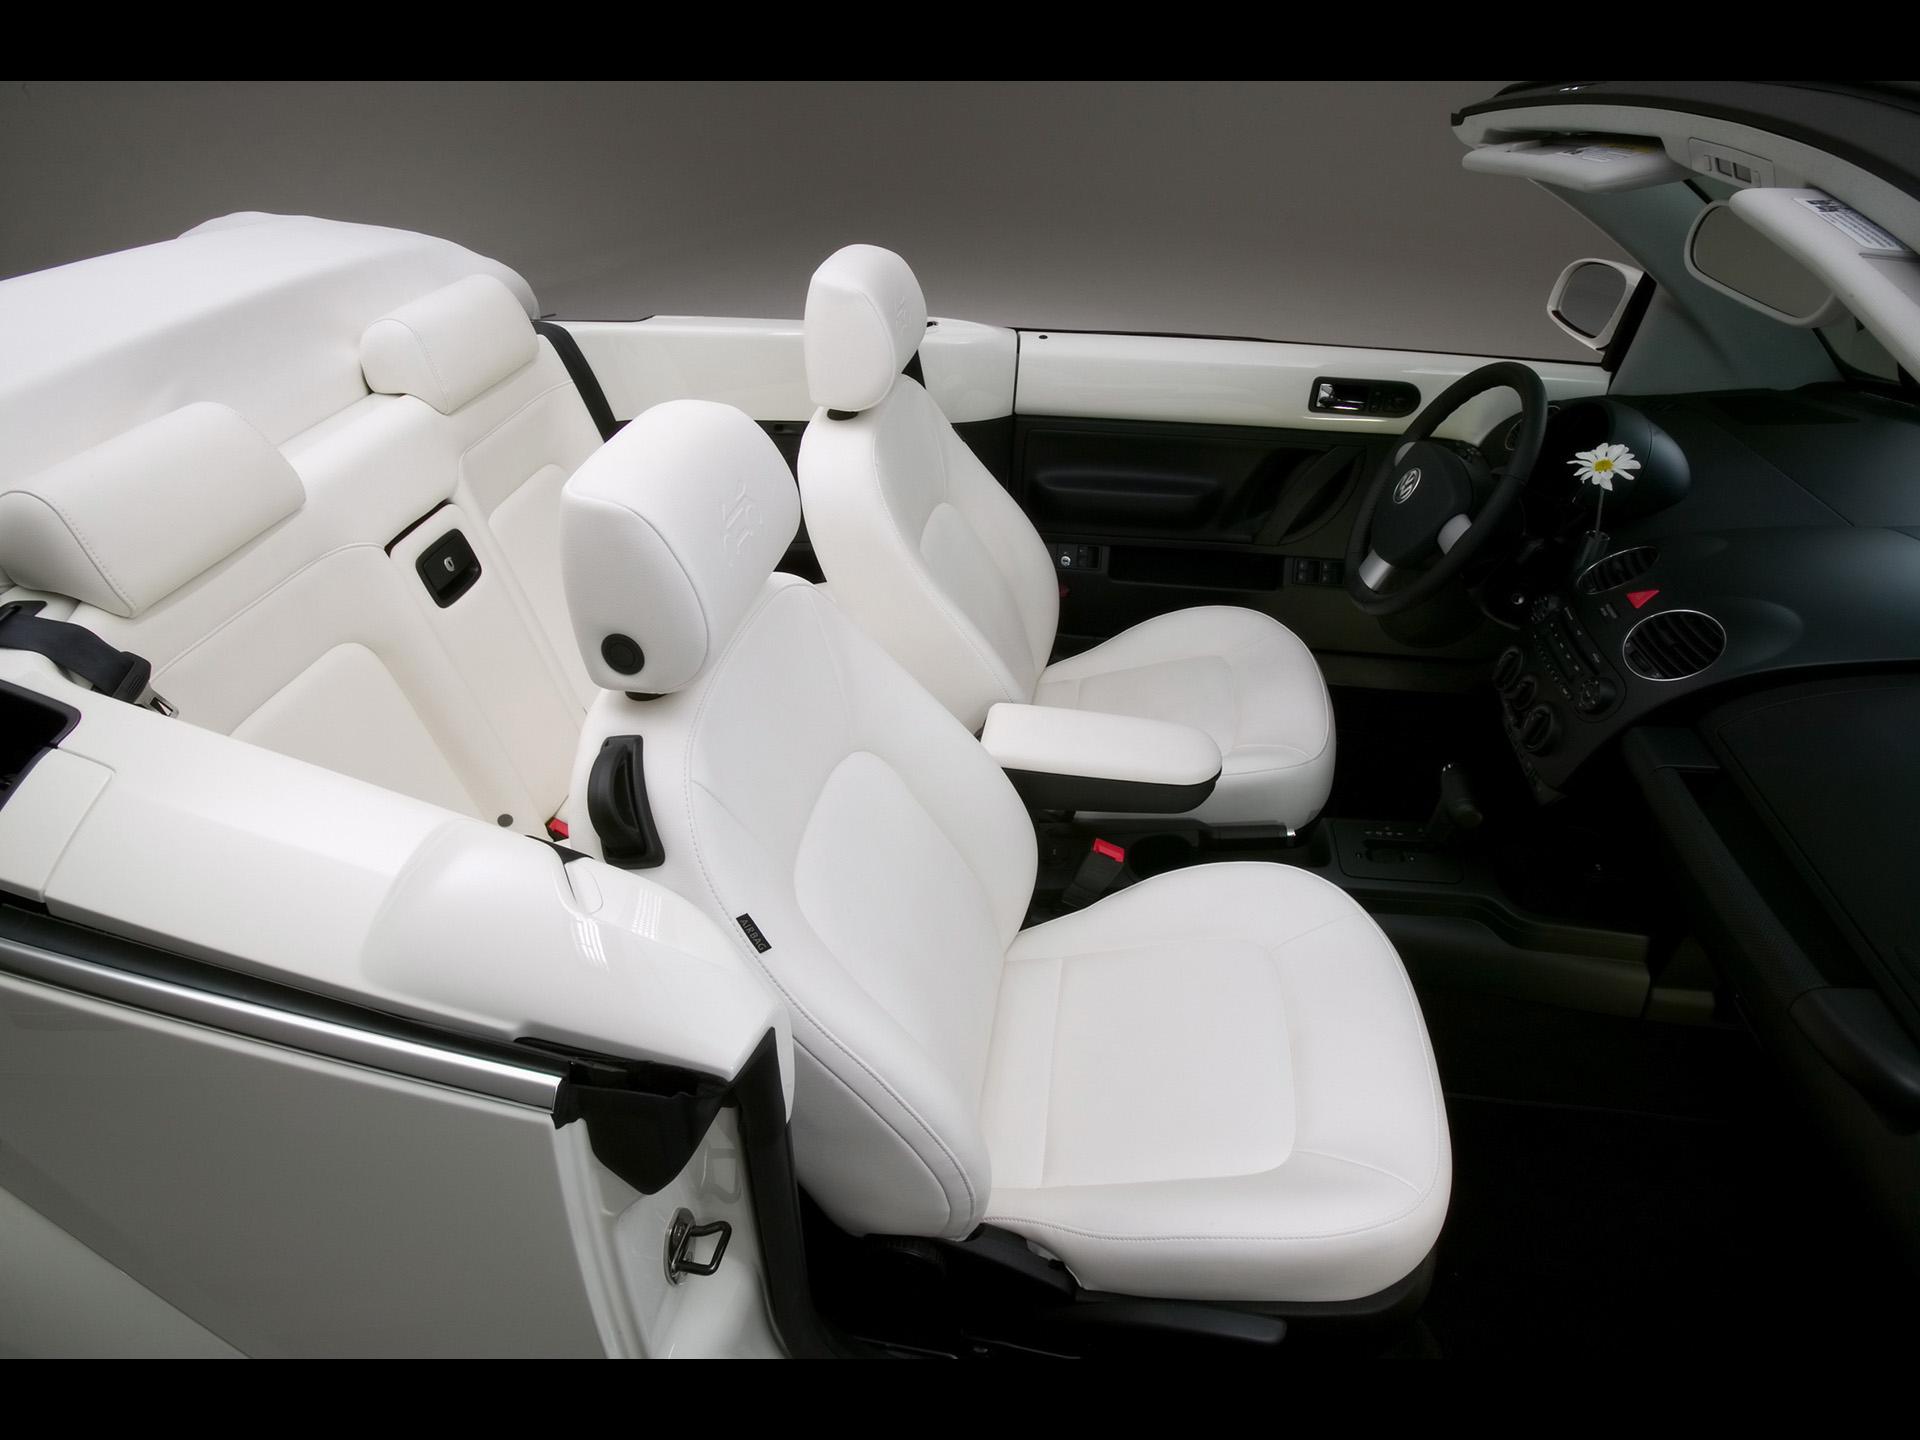 volkswagen  beetle convertible triple white  photogallery   pics carsbasecom